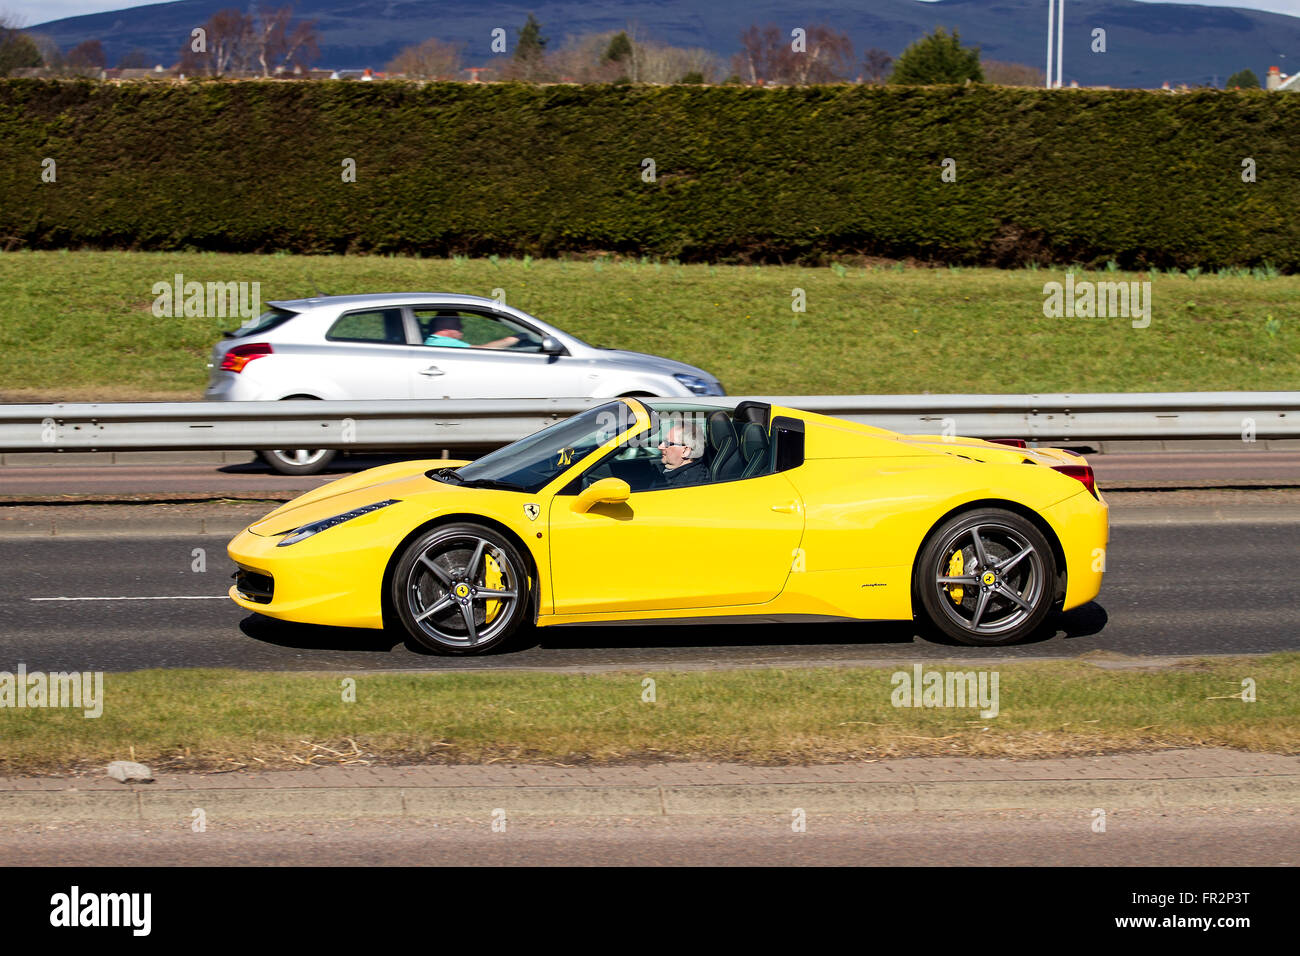 A Yellow Ferrari 458 Italia Spider Convertible Sports Car Travelling